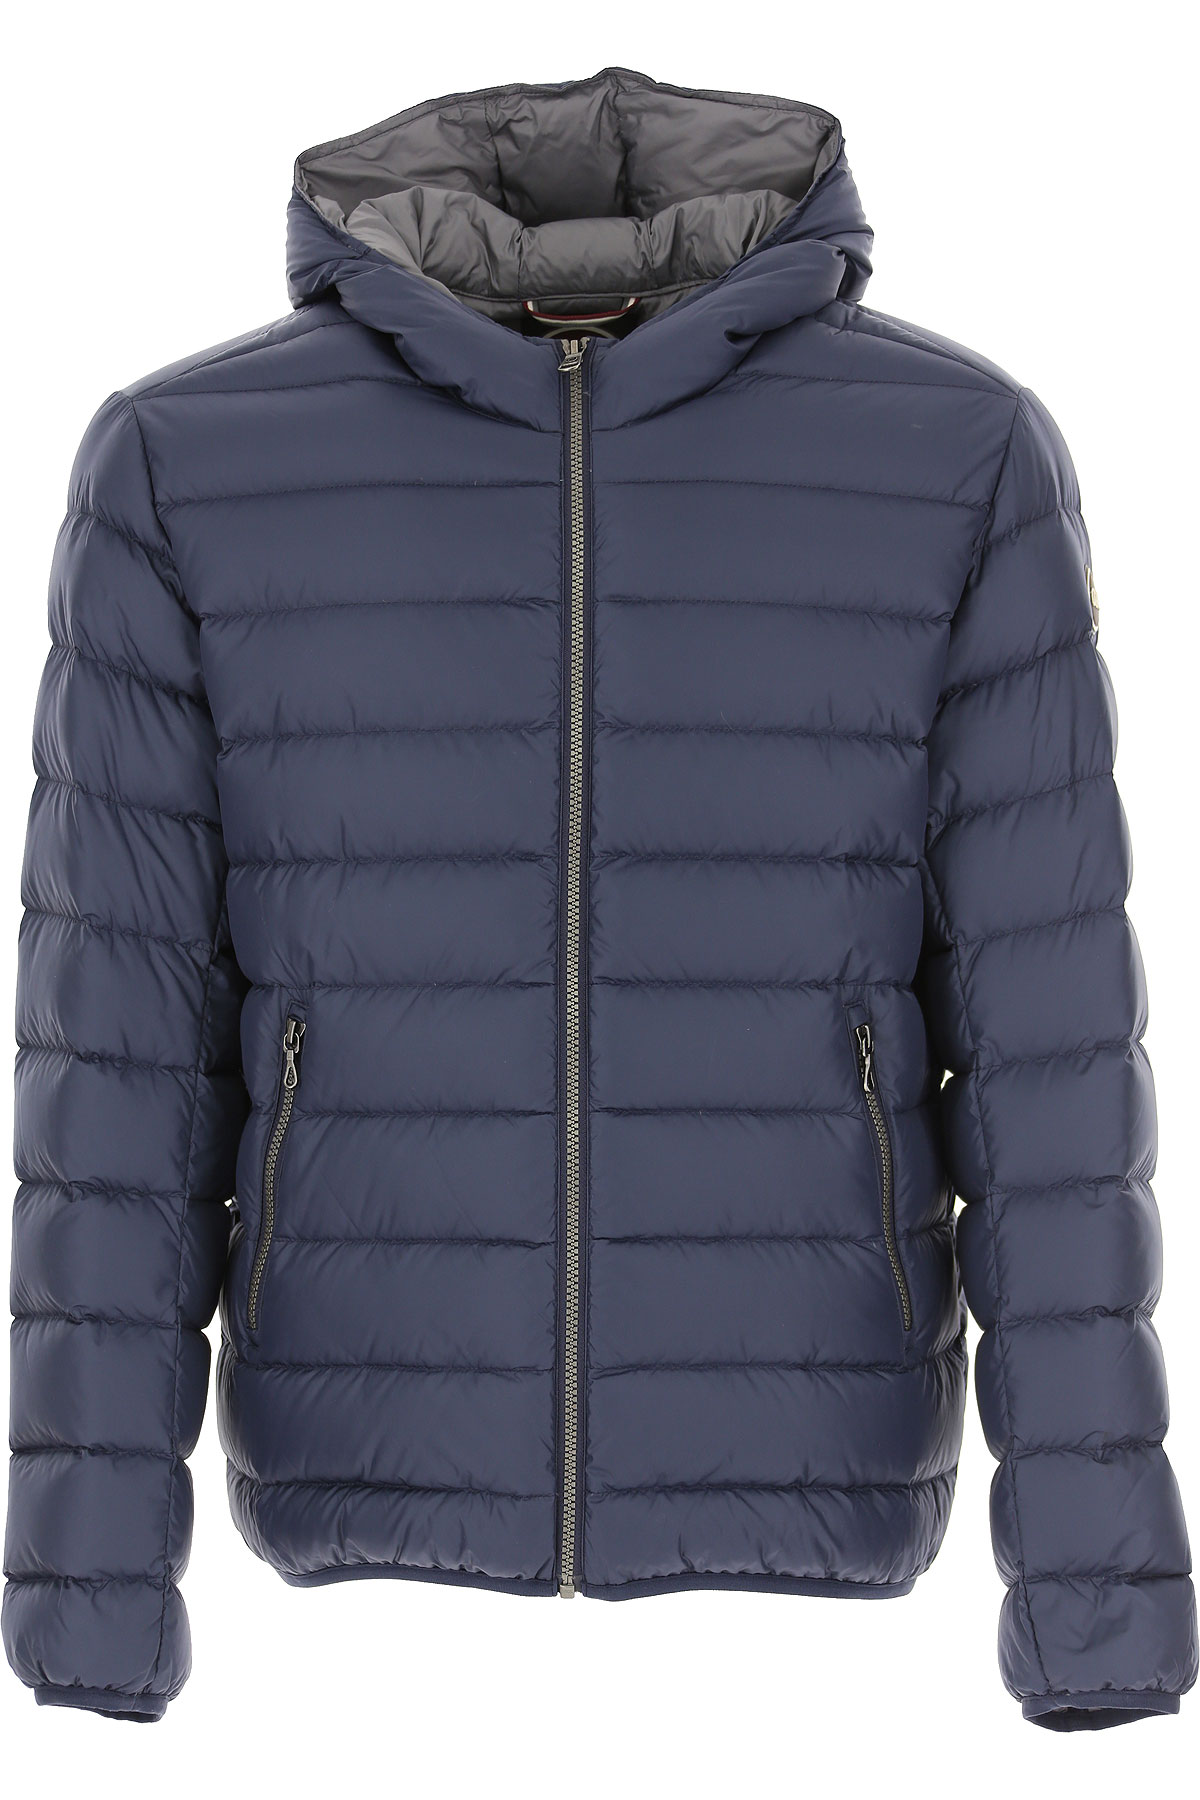 Colmar Down Jacket for Men, Puffer Ski Jacket On Sale, navy, polyamide, 2019, L M S XL XXL XXXL